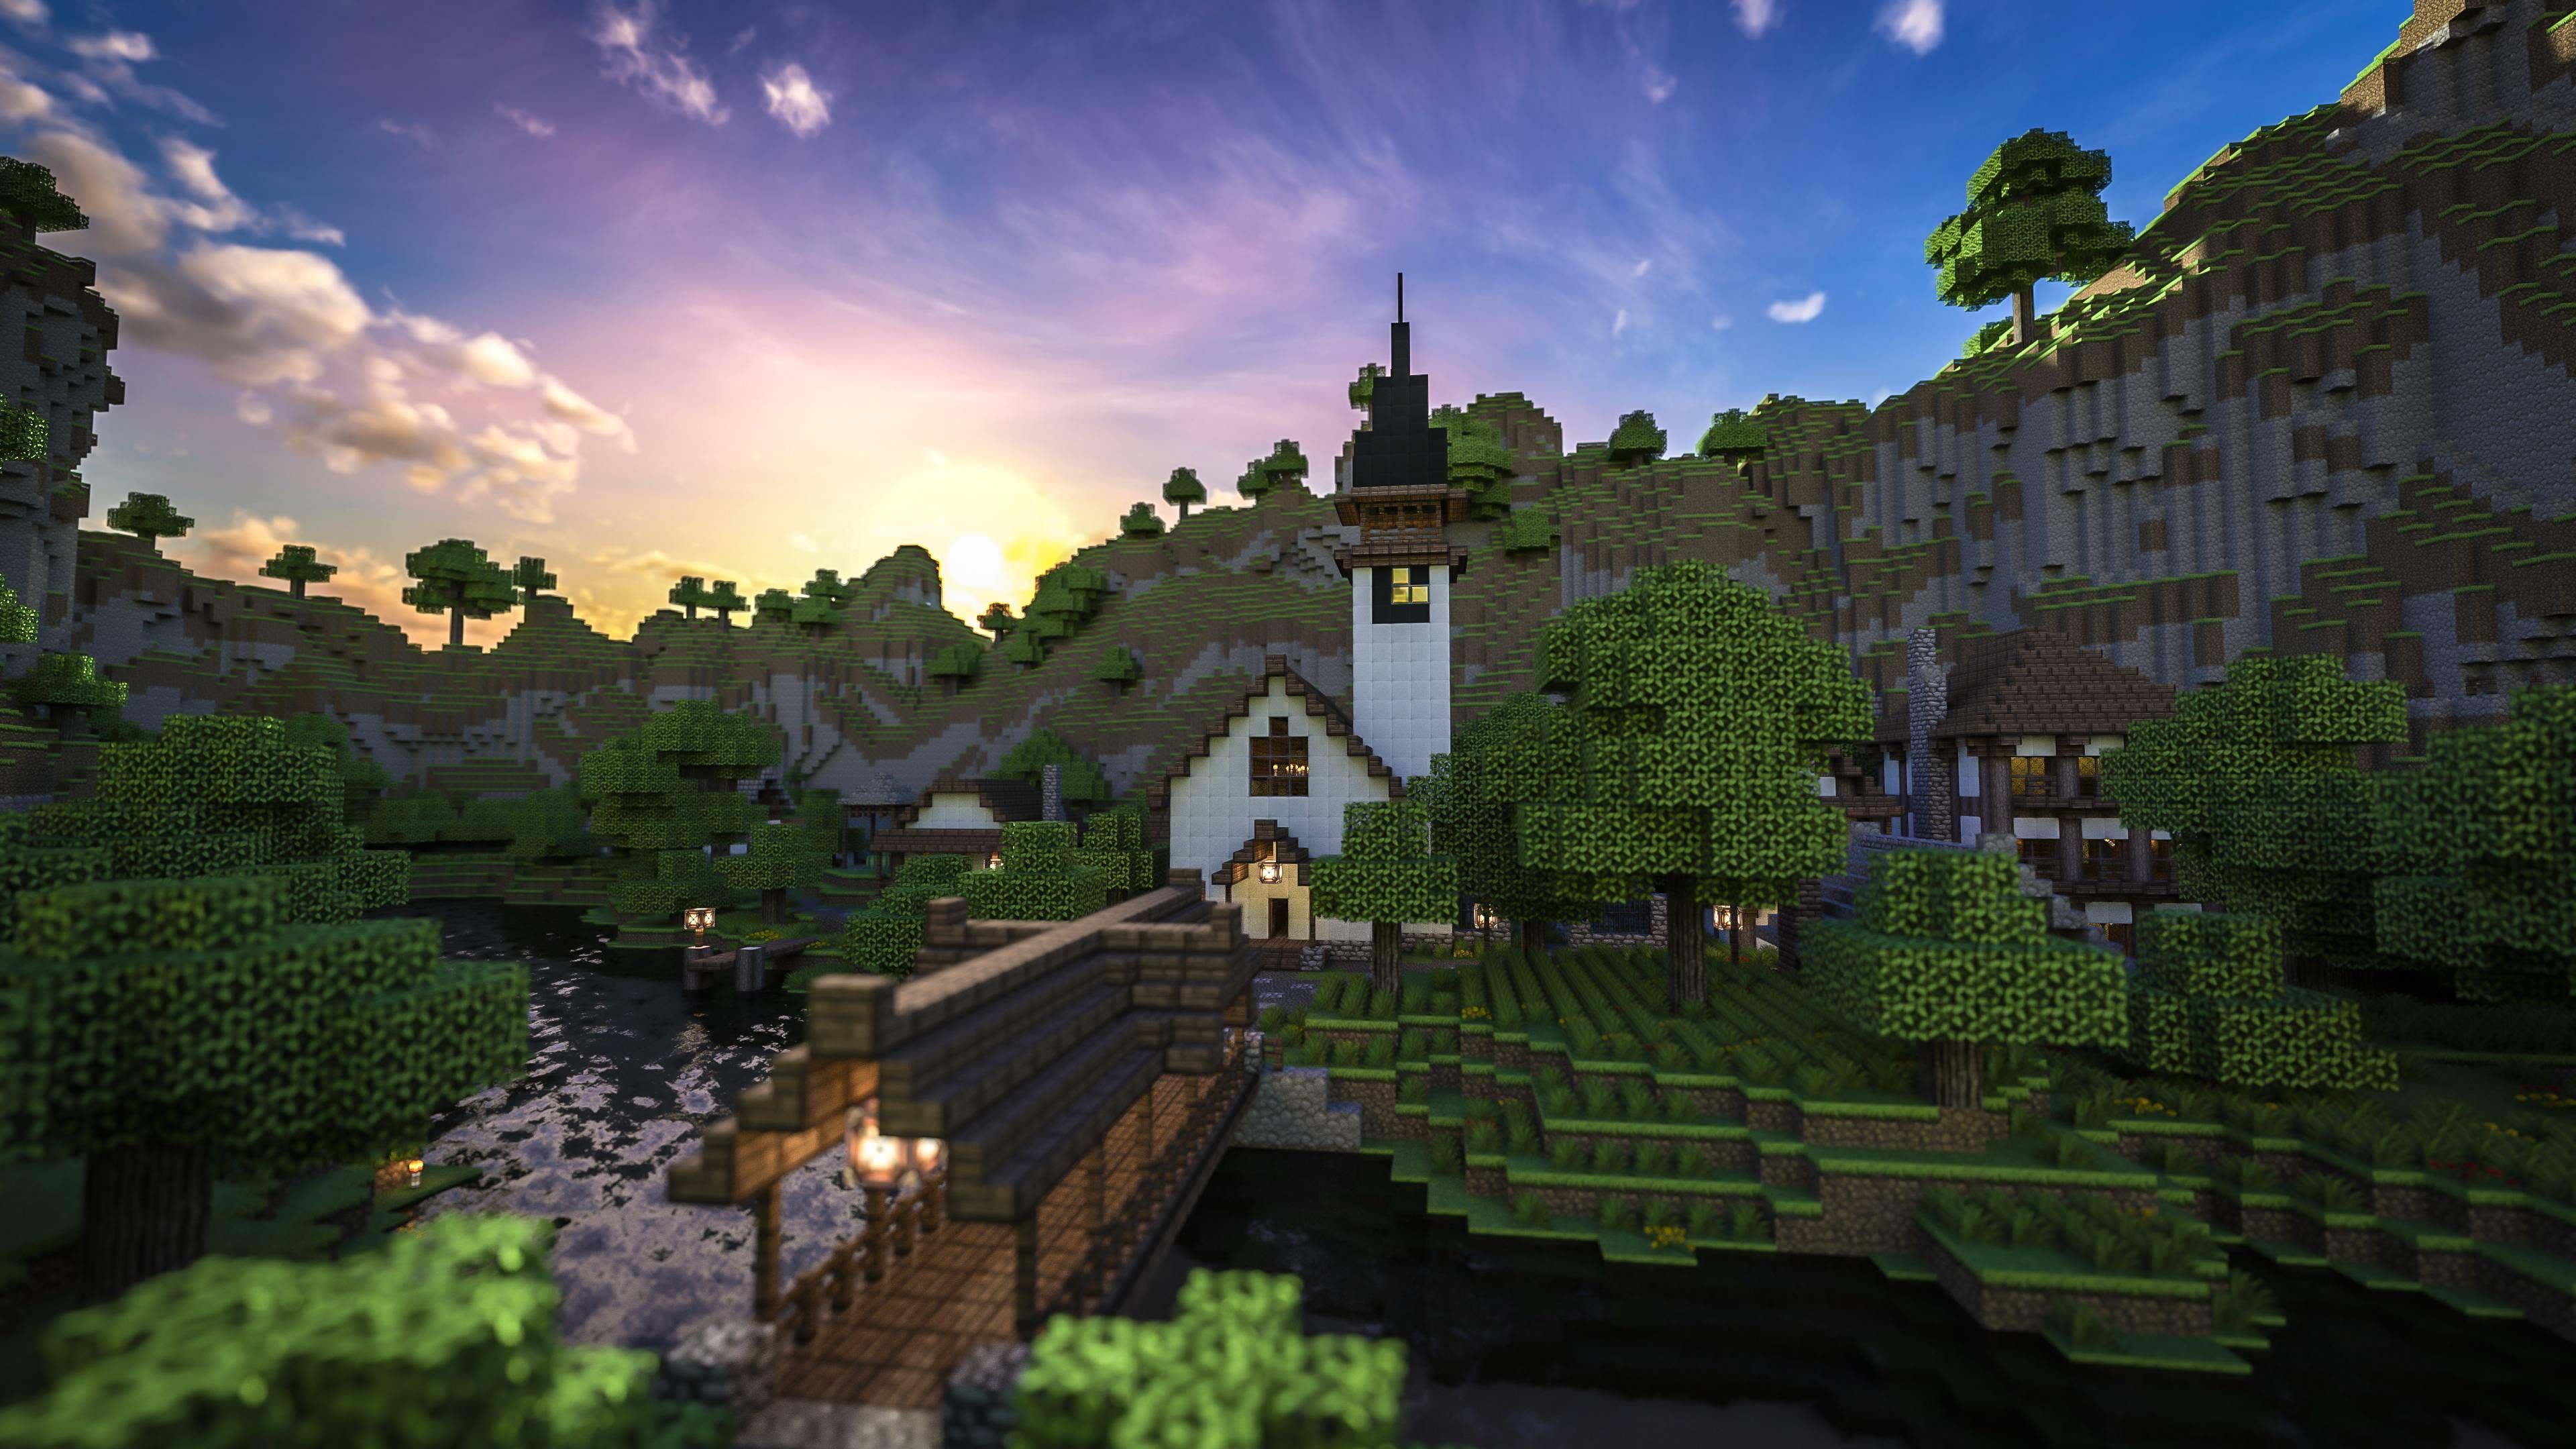 minecraft city hd wallpapers Minecraft Pinterest